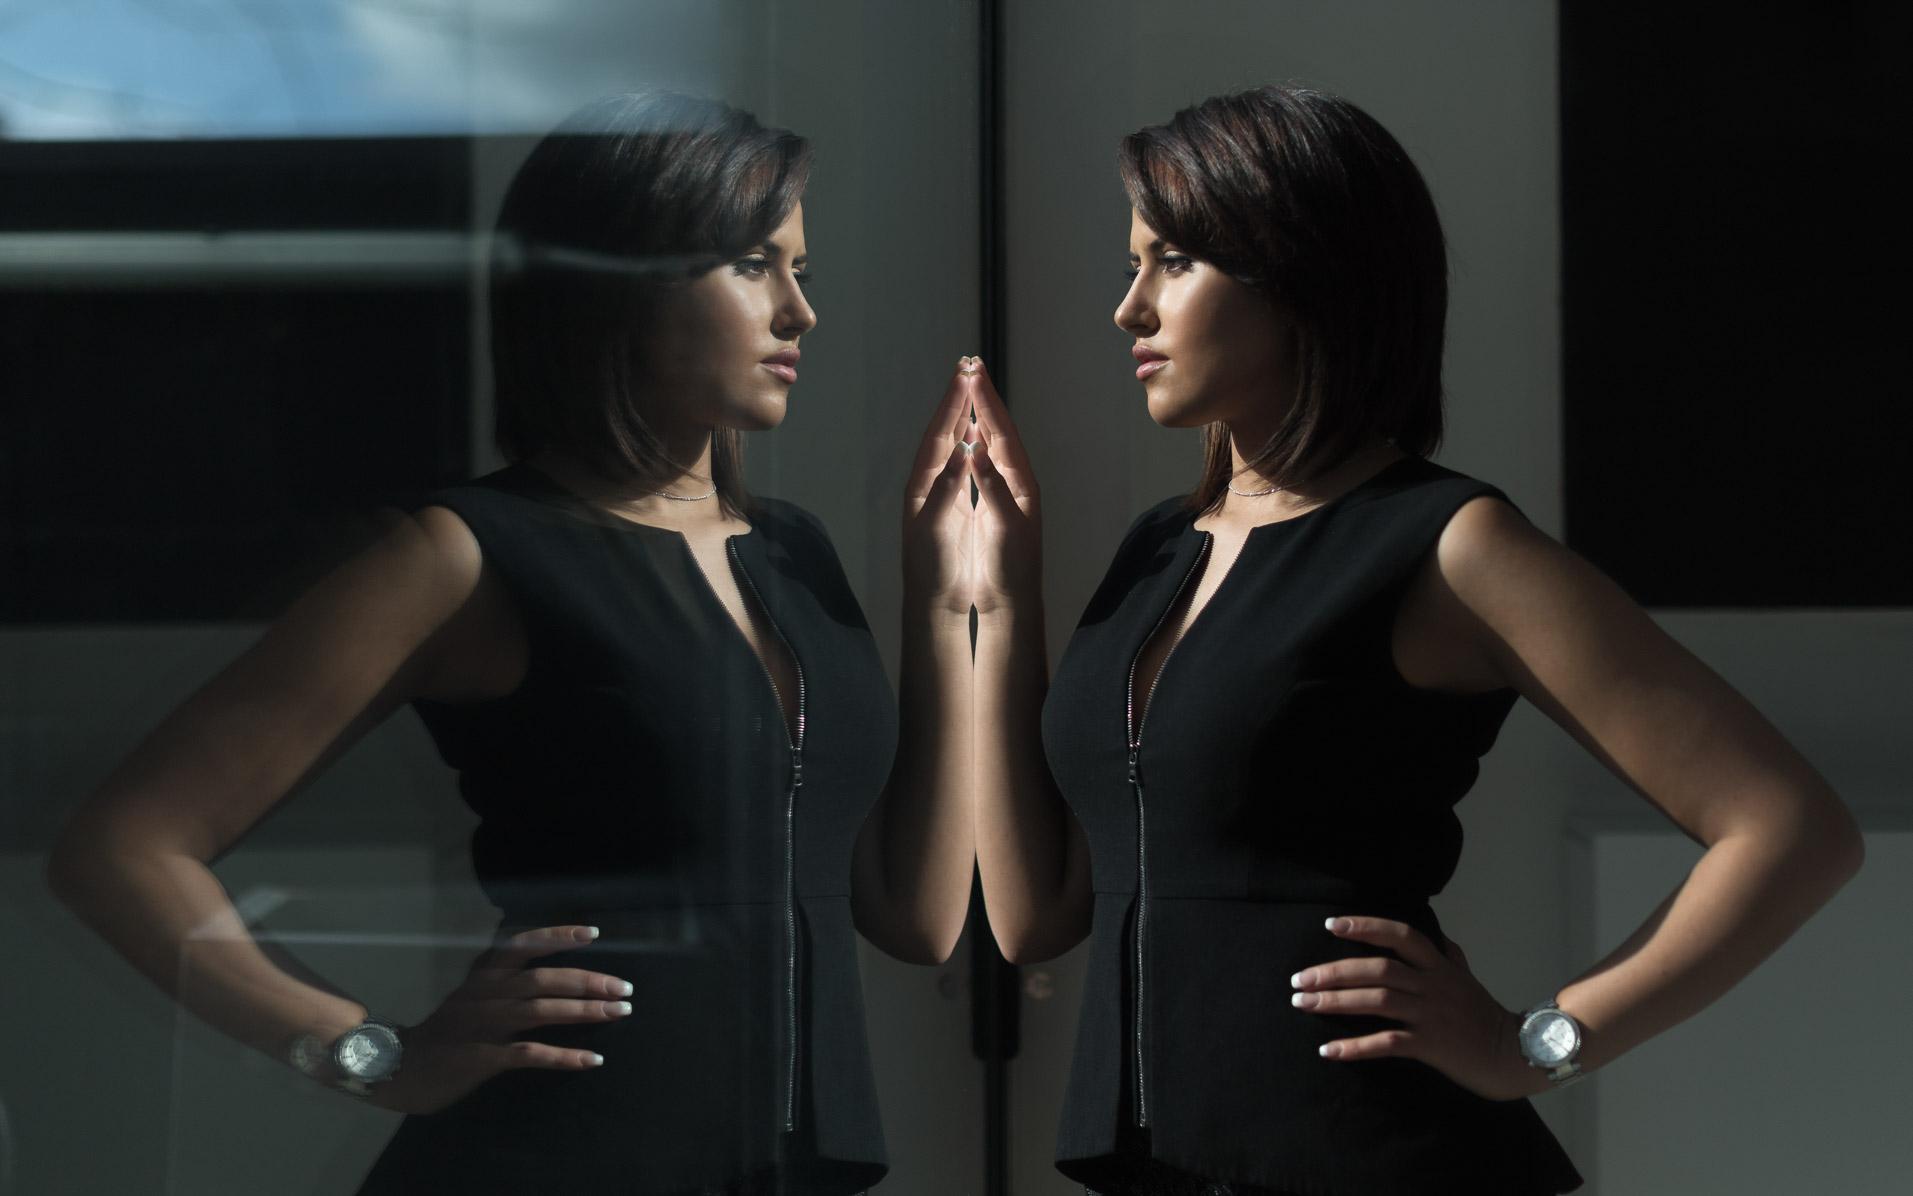 portrait-reflection.jpg